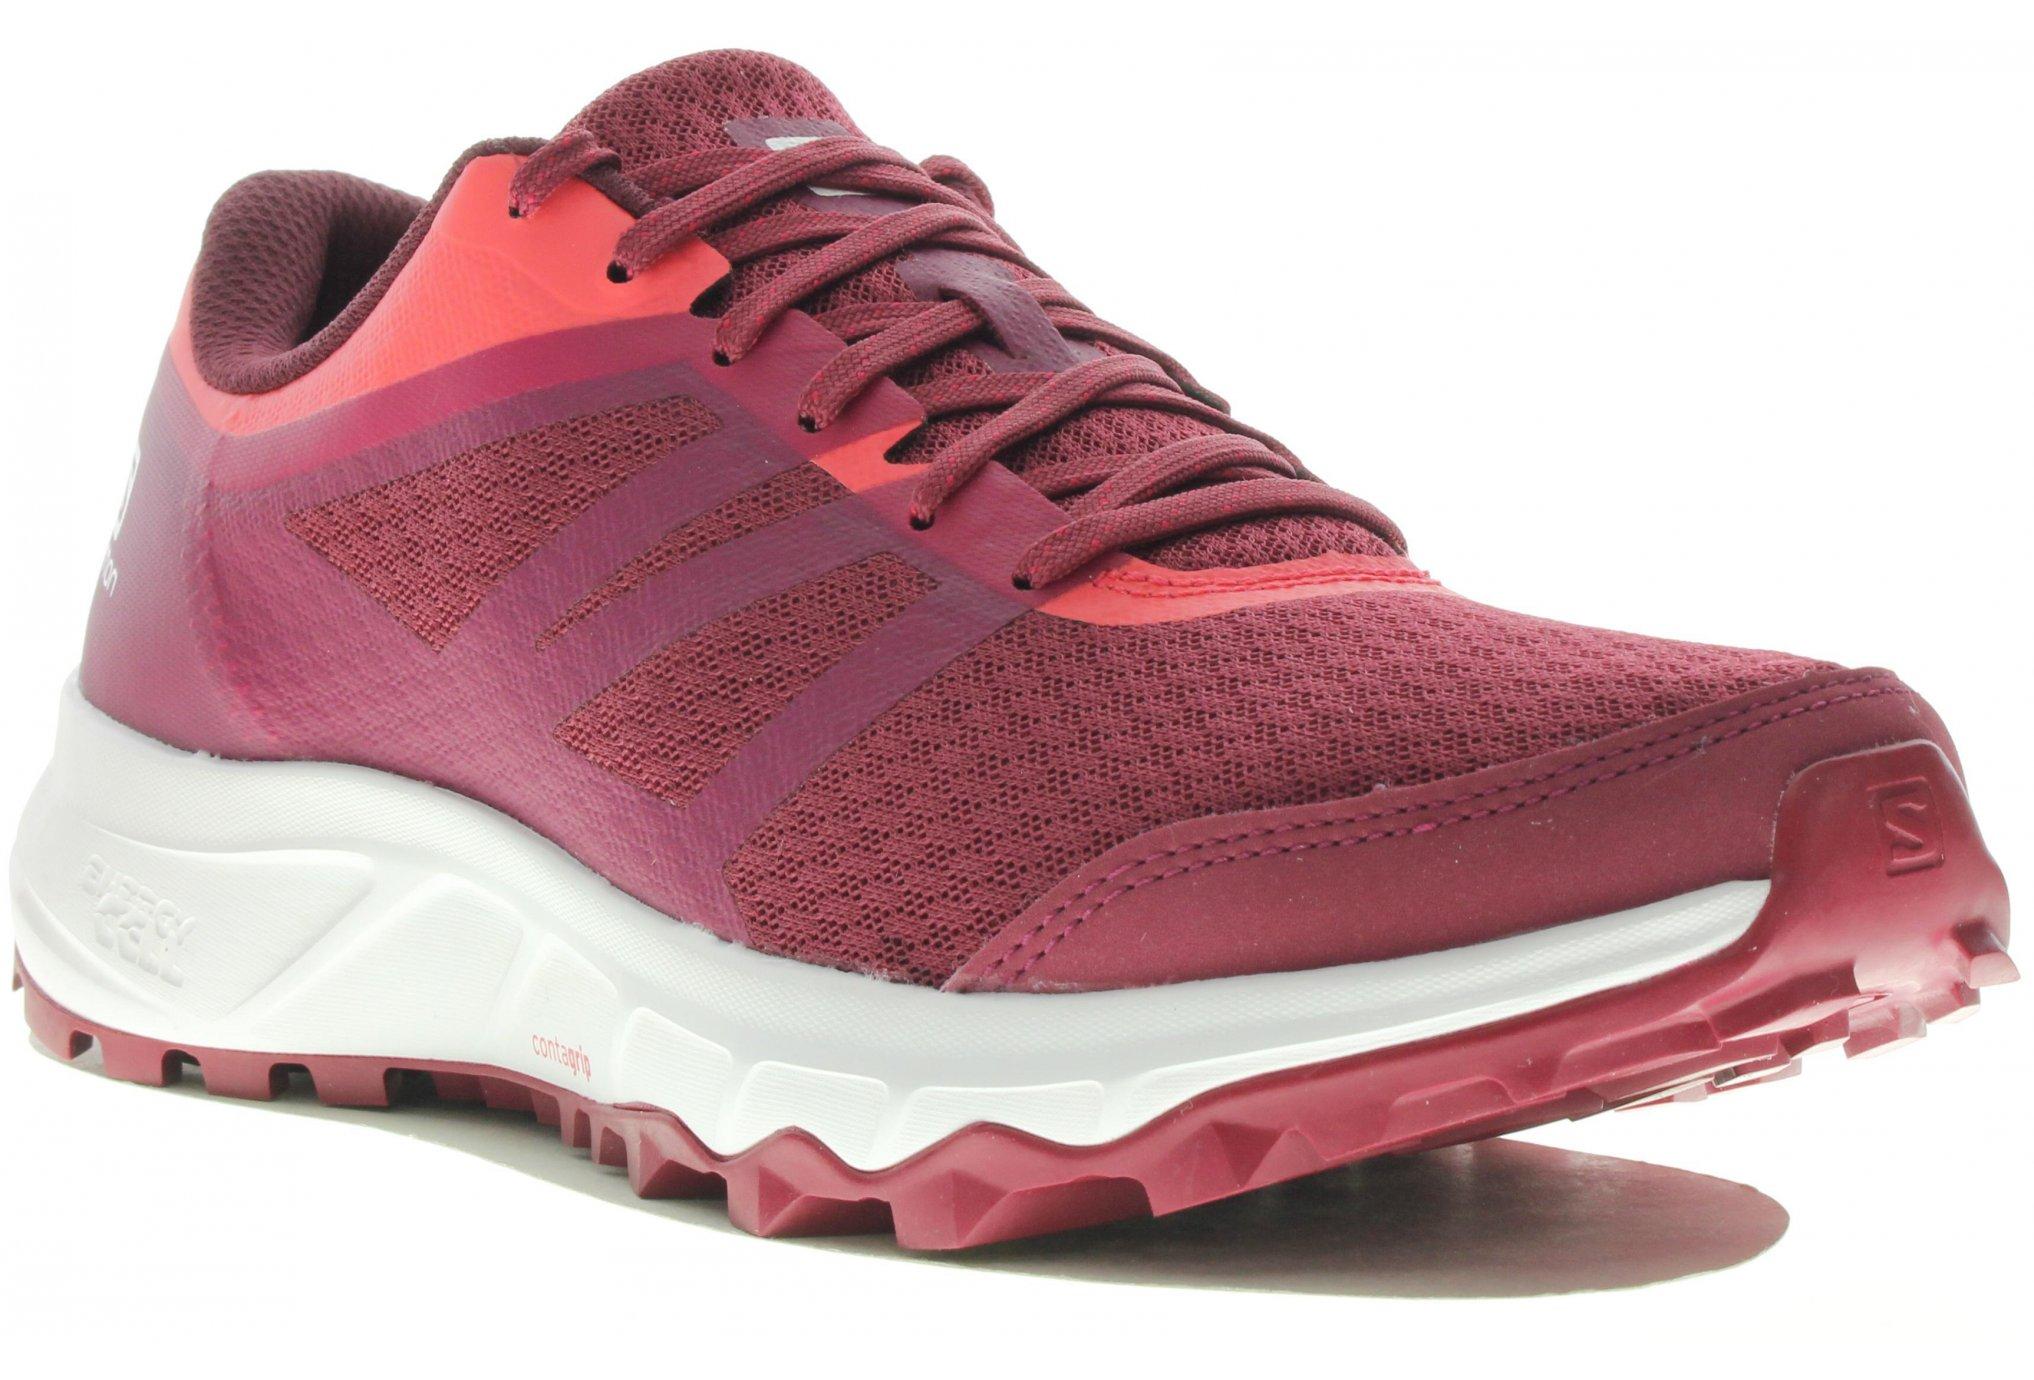 Salomon Trailster 2 Chaussures running femme